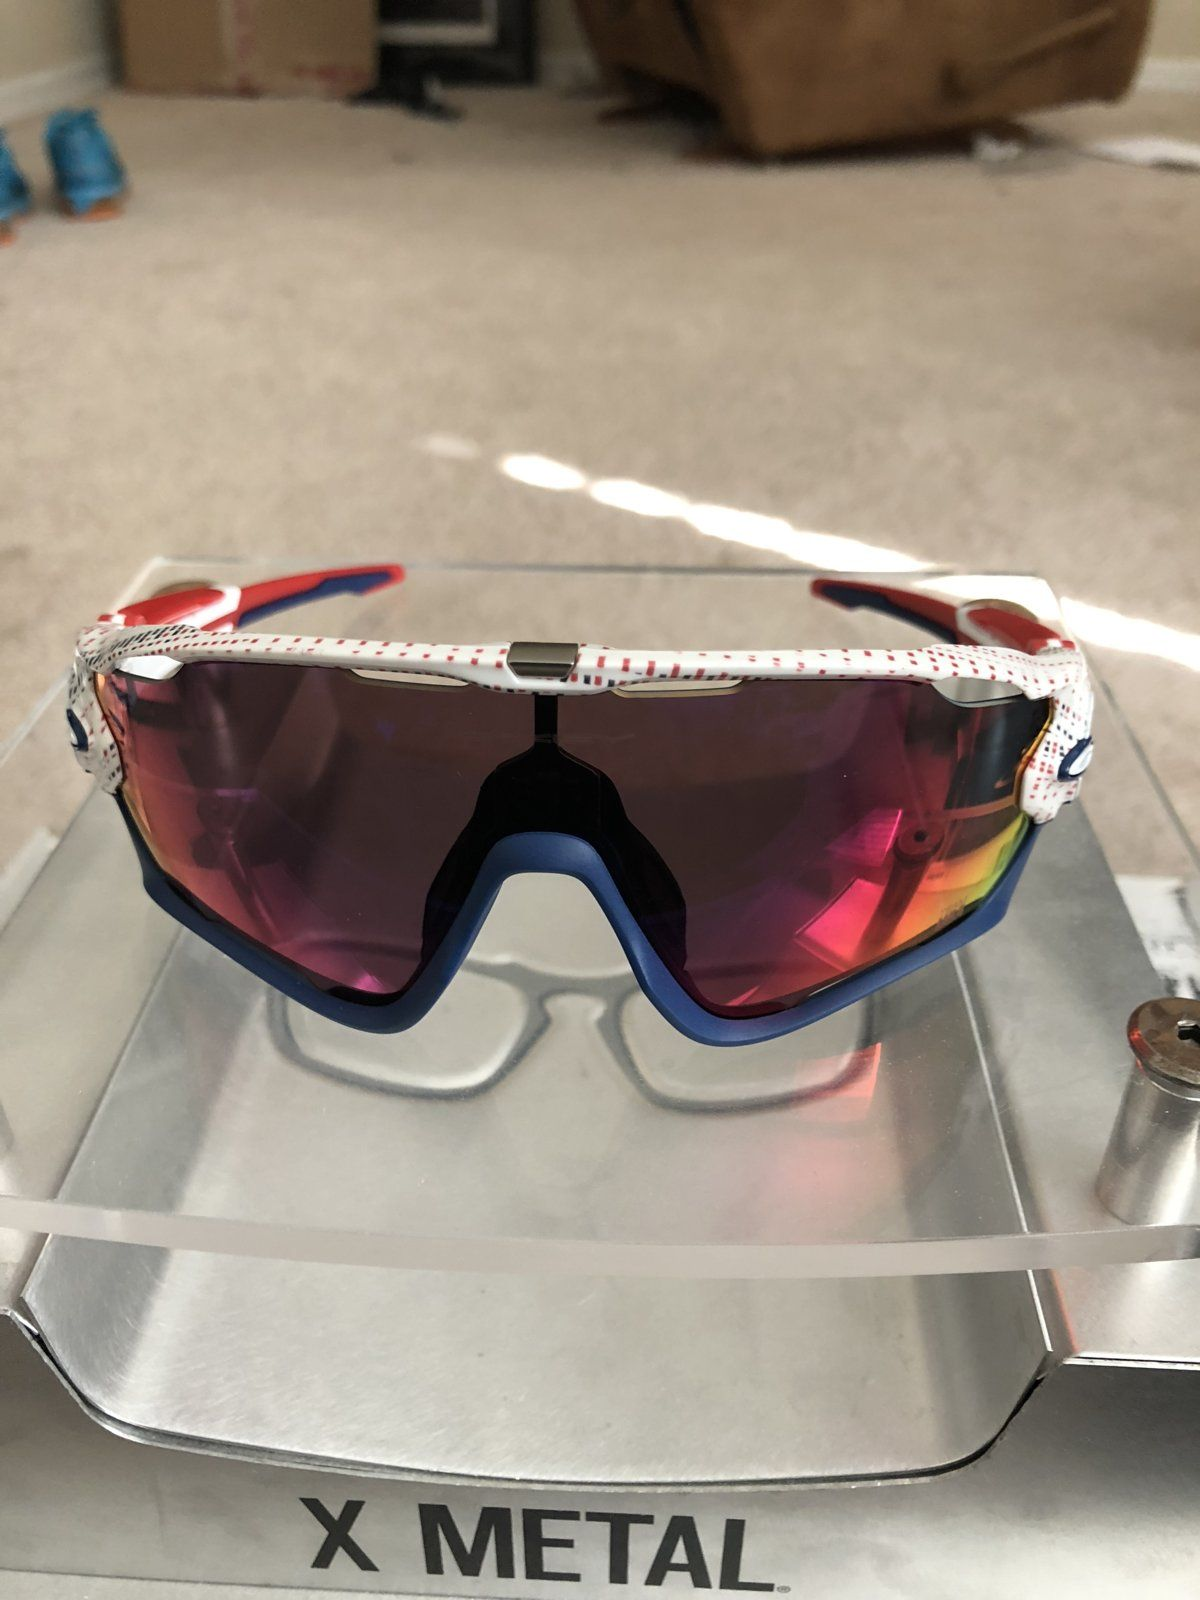 15 pairs for sale (new stuff-part 1) - EDF2747C-867A-4B86-BAAF-D3A6393D1E8F.jpeg